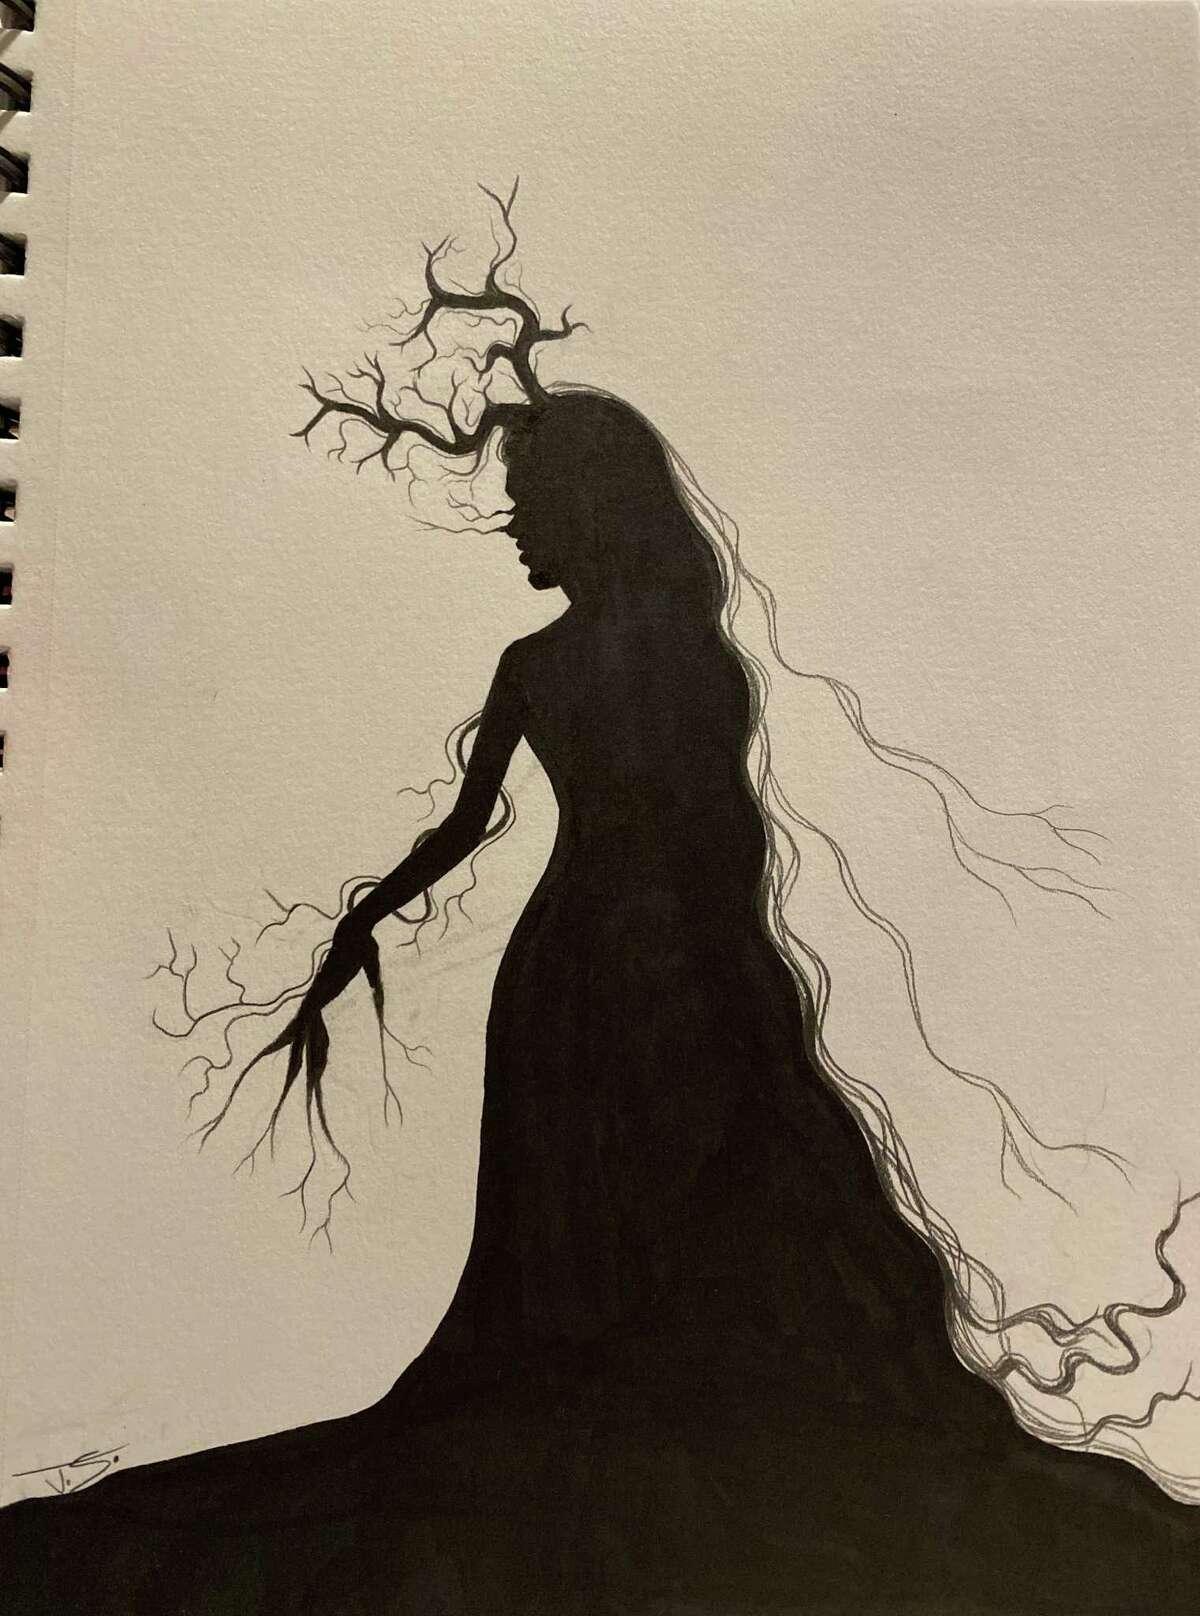 Shelton High School freshman Joao Sousa's work, which was inspired by artist Kara Walker.